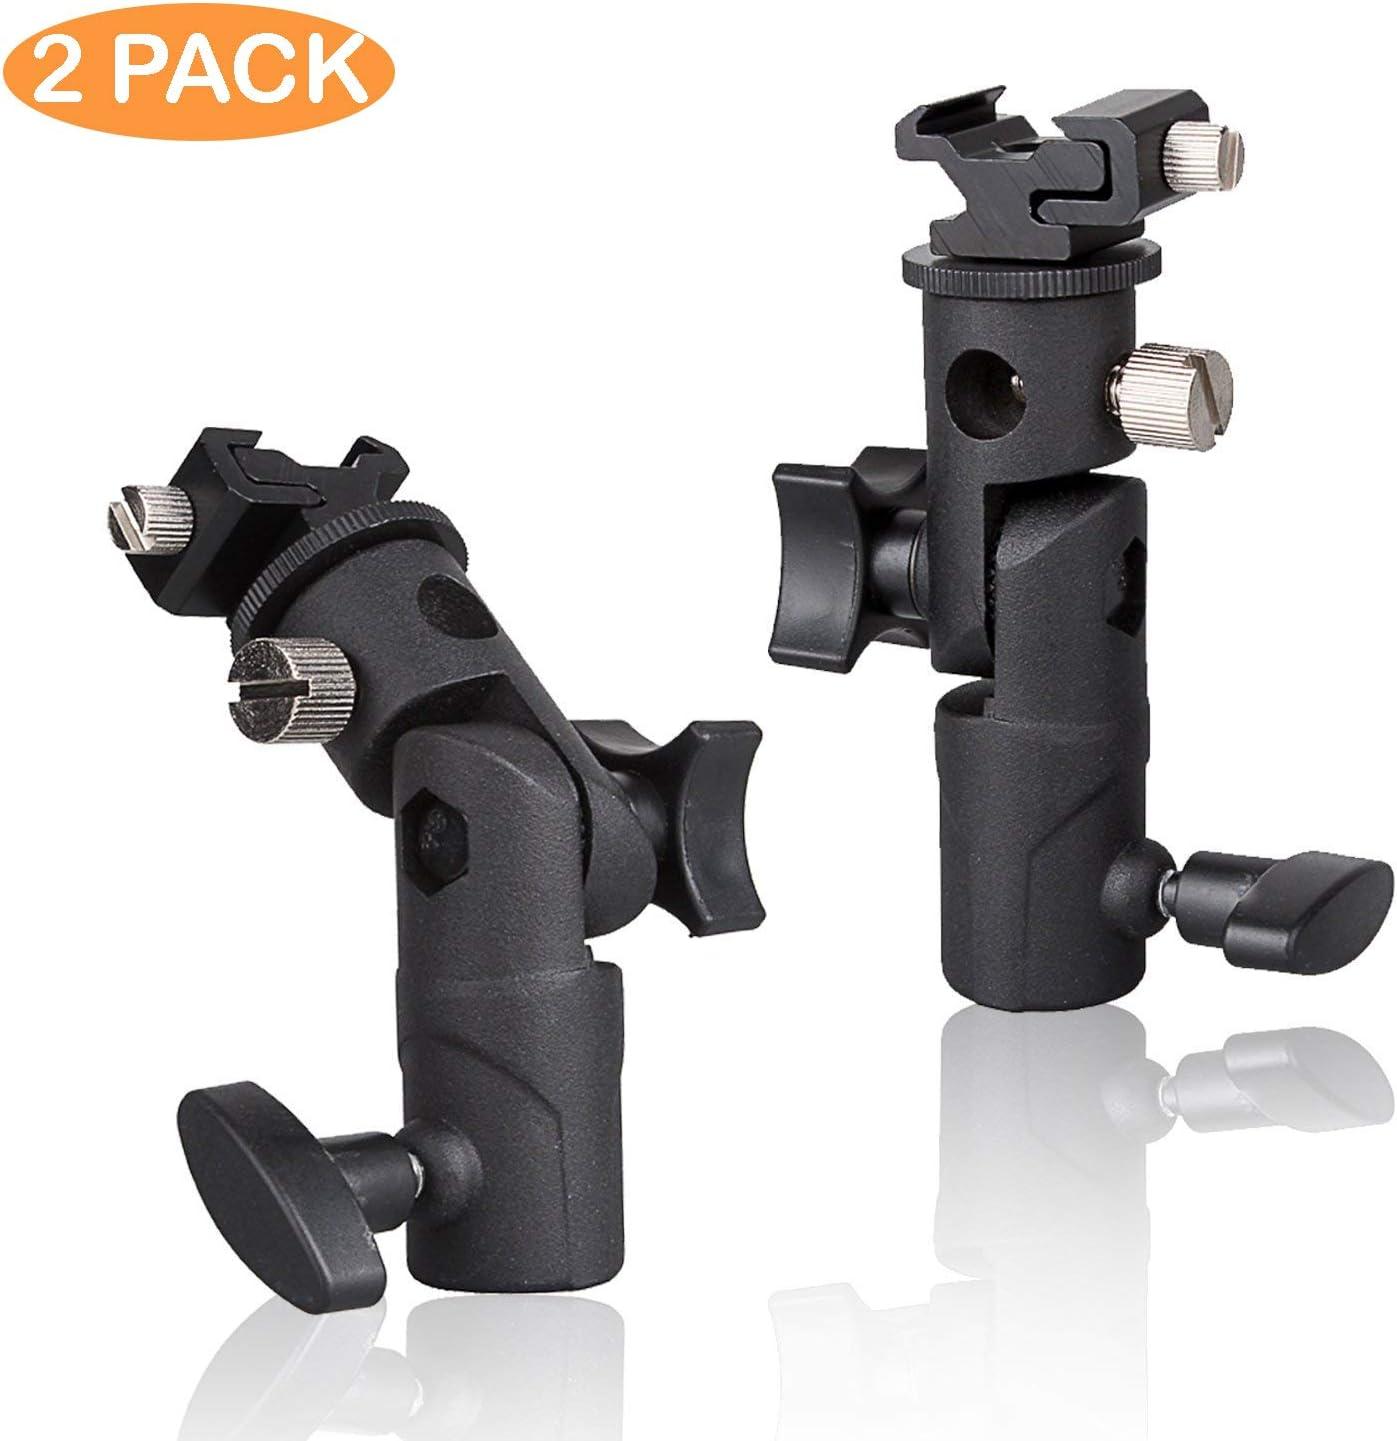 2 pcs 3//8 inch Male Convert Screw Threaded Screw Adapter Spigot Stud for Flash Bracket Light Stand JSAG354 Standard 1//4 Julius Studio Hot Shoe Adapter